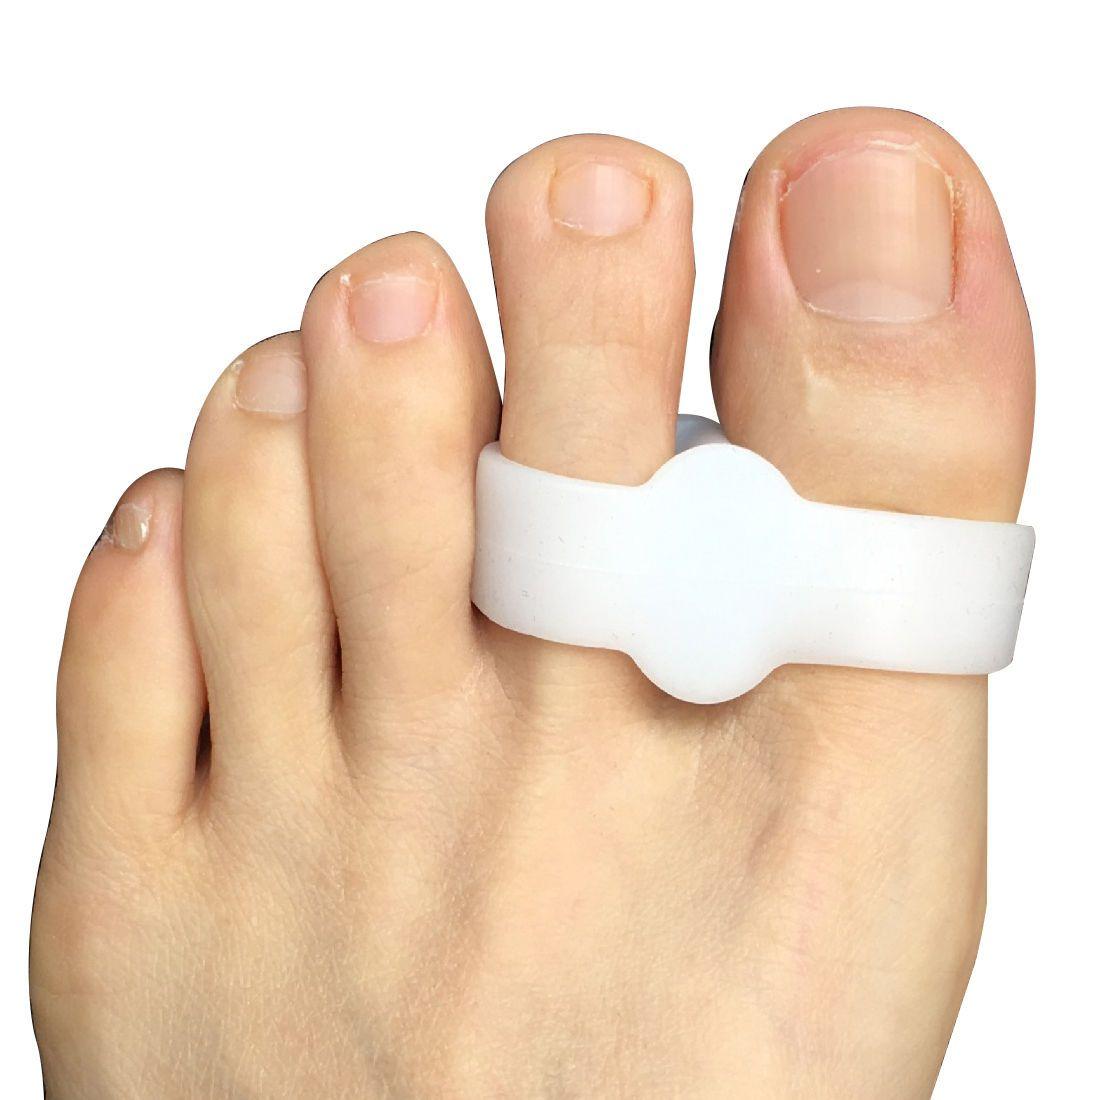 Silicone Gel Bunion Splint Big Toe Overlapping Spreader Protection Hallux Valgus Correction 1pair Foot Fingers Separator Thumb Protect 099 Corrector Ebay Fashion